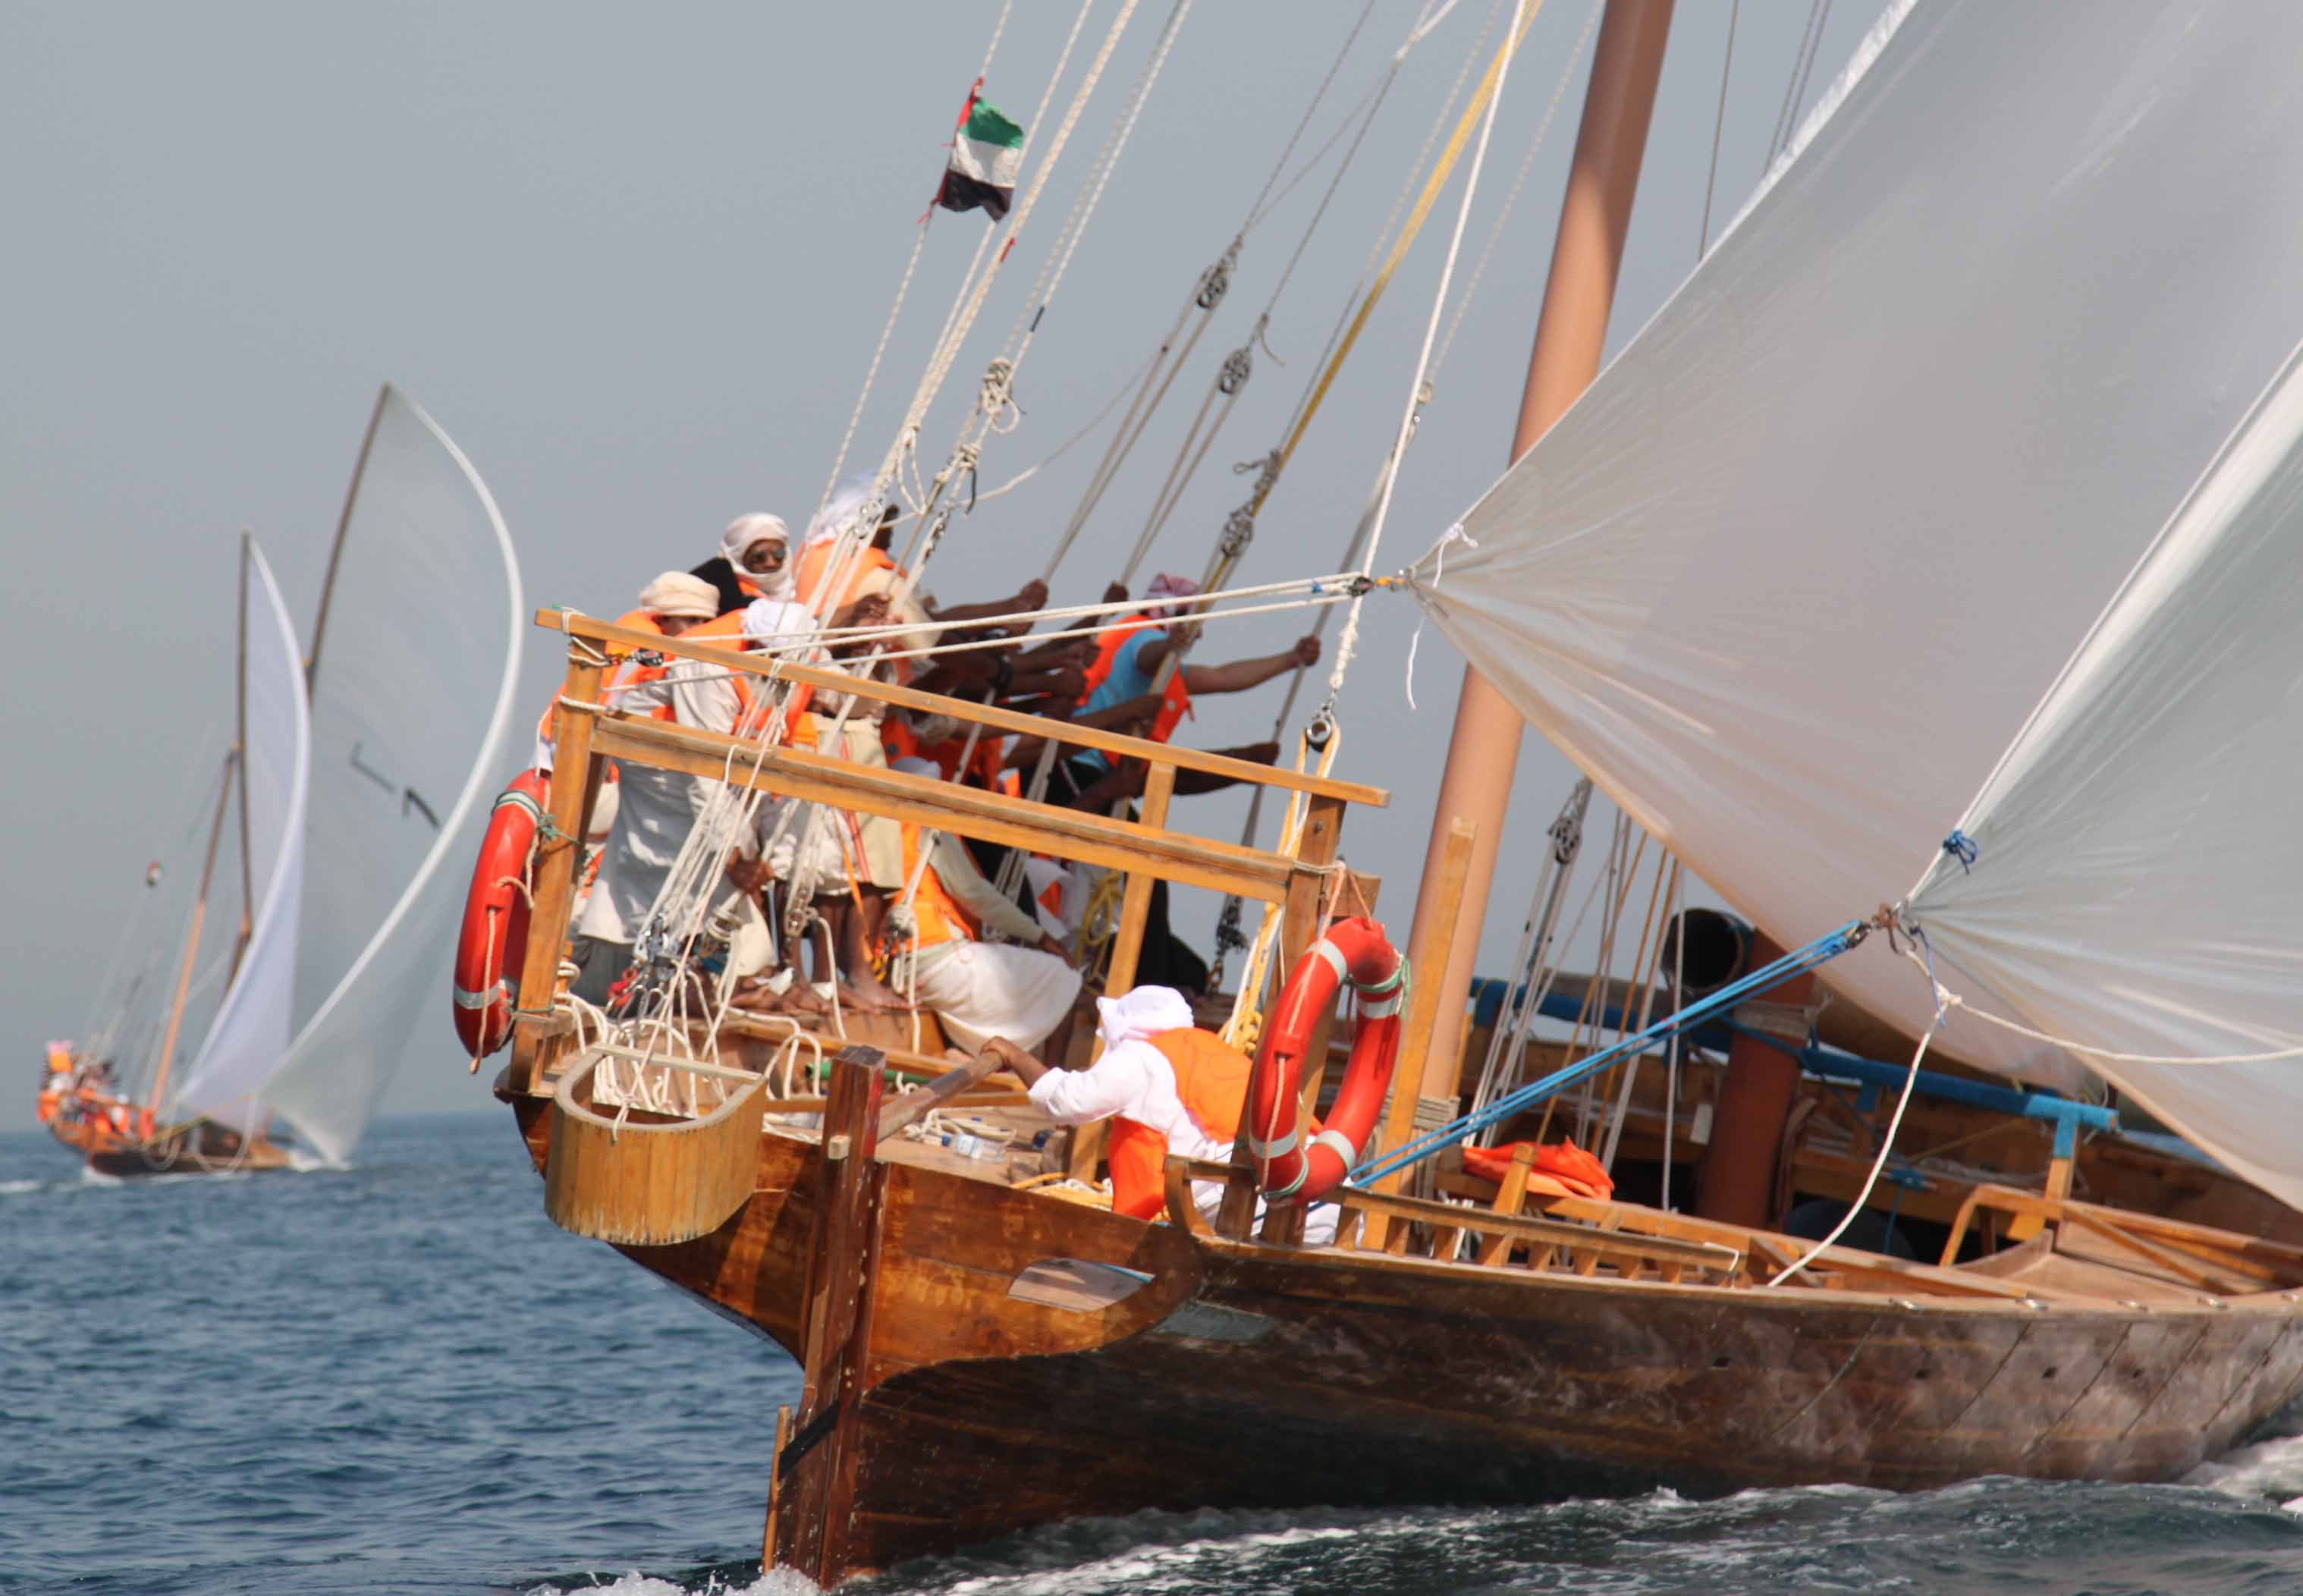 Dubai regains its position as shipbuilding and maritime centre for The sail dubai